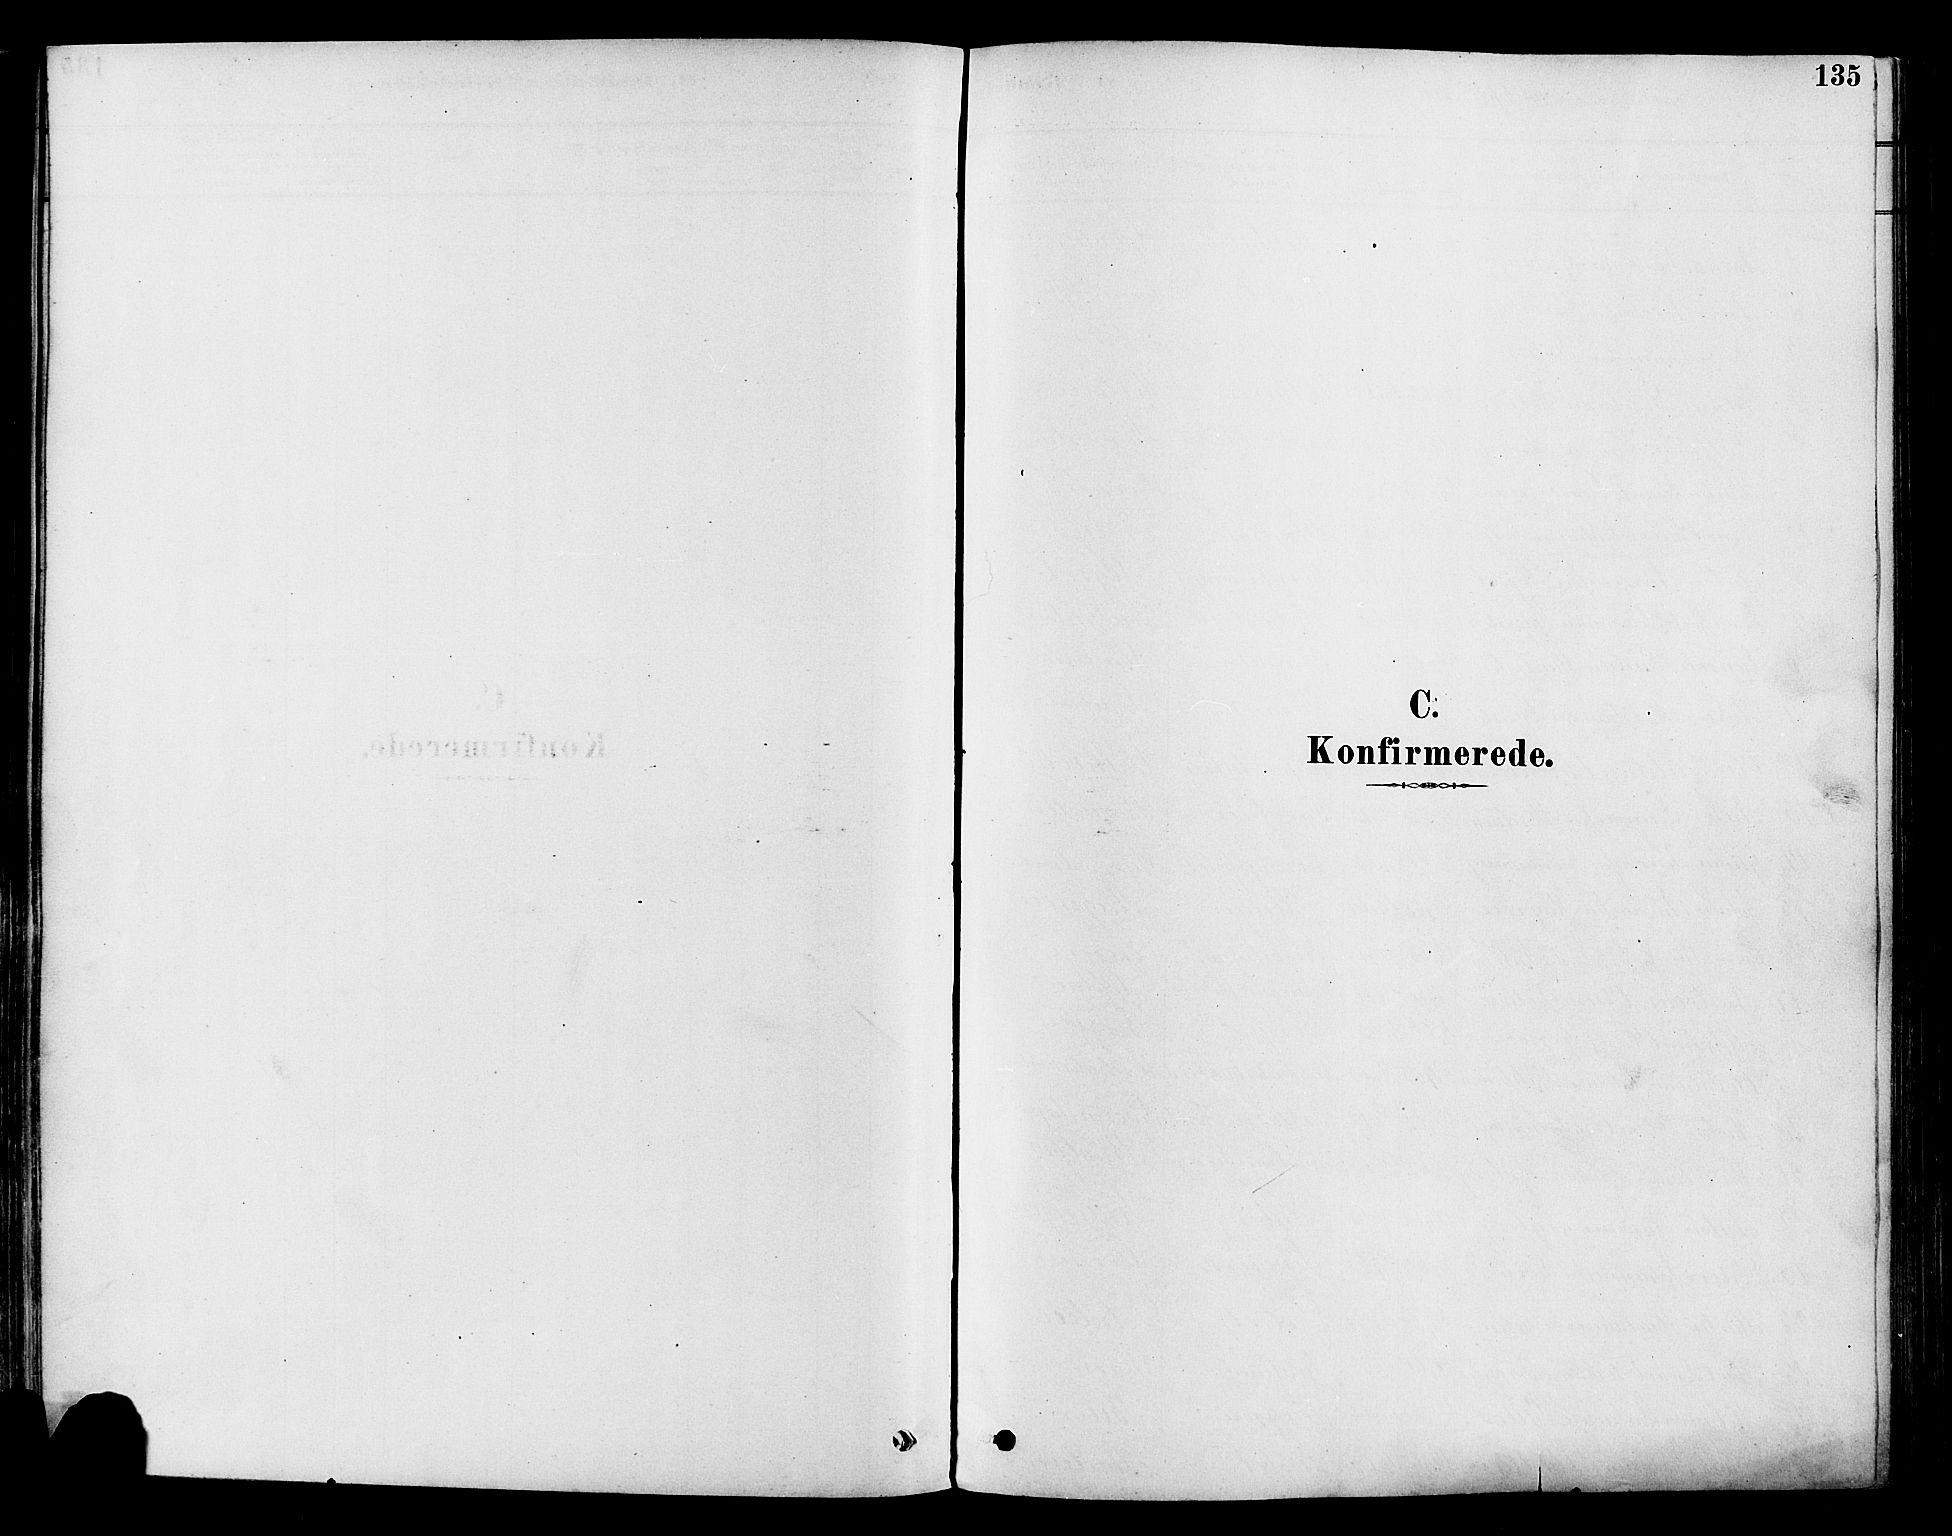 SAH, Vestre Toten prestekontor, H/Ha/Haa/L0009: Ministerialbok nr. 9, 1878-1894, s. 135